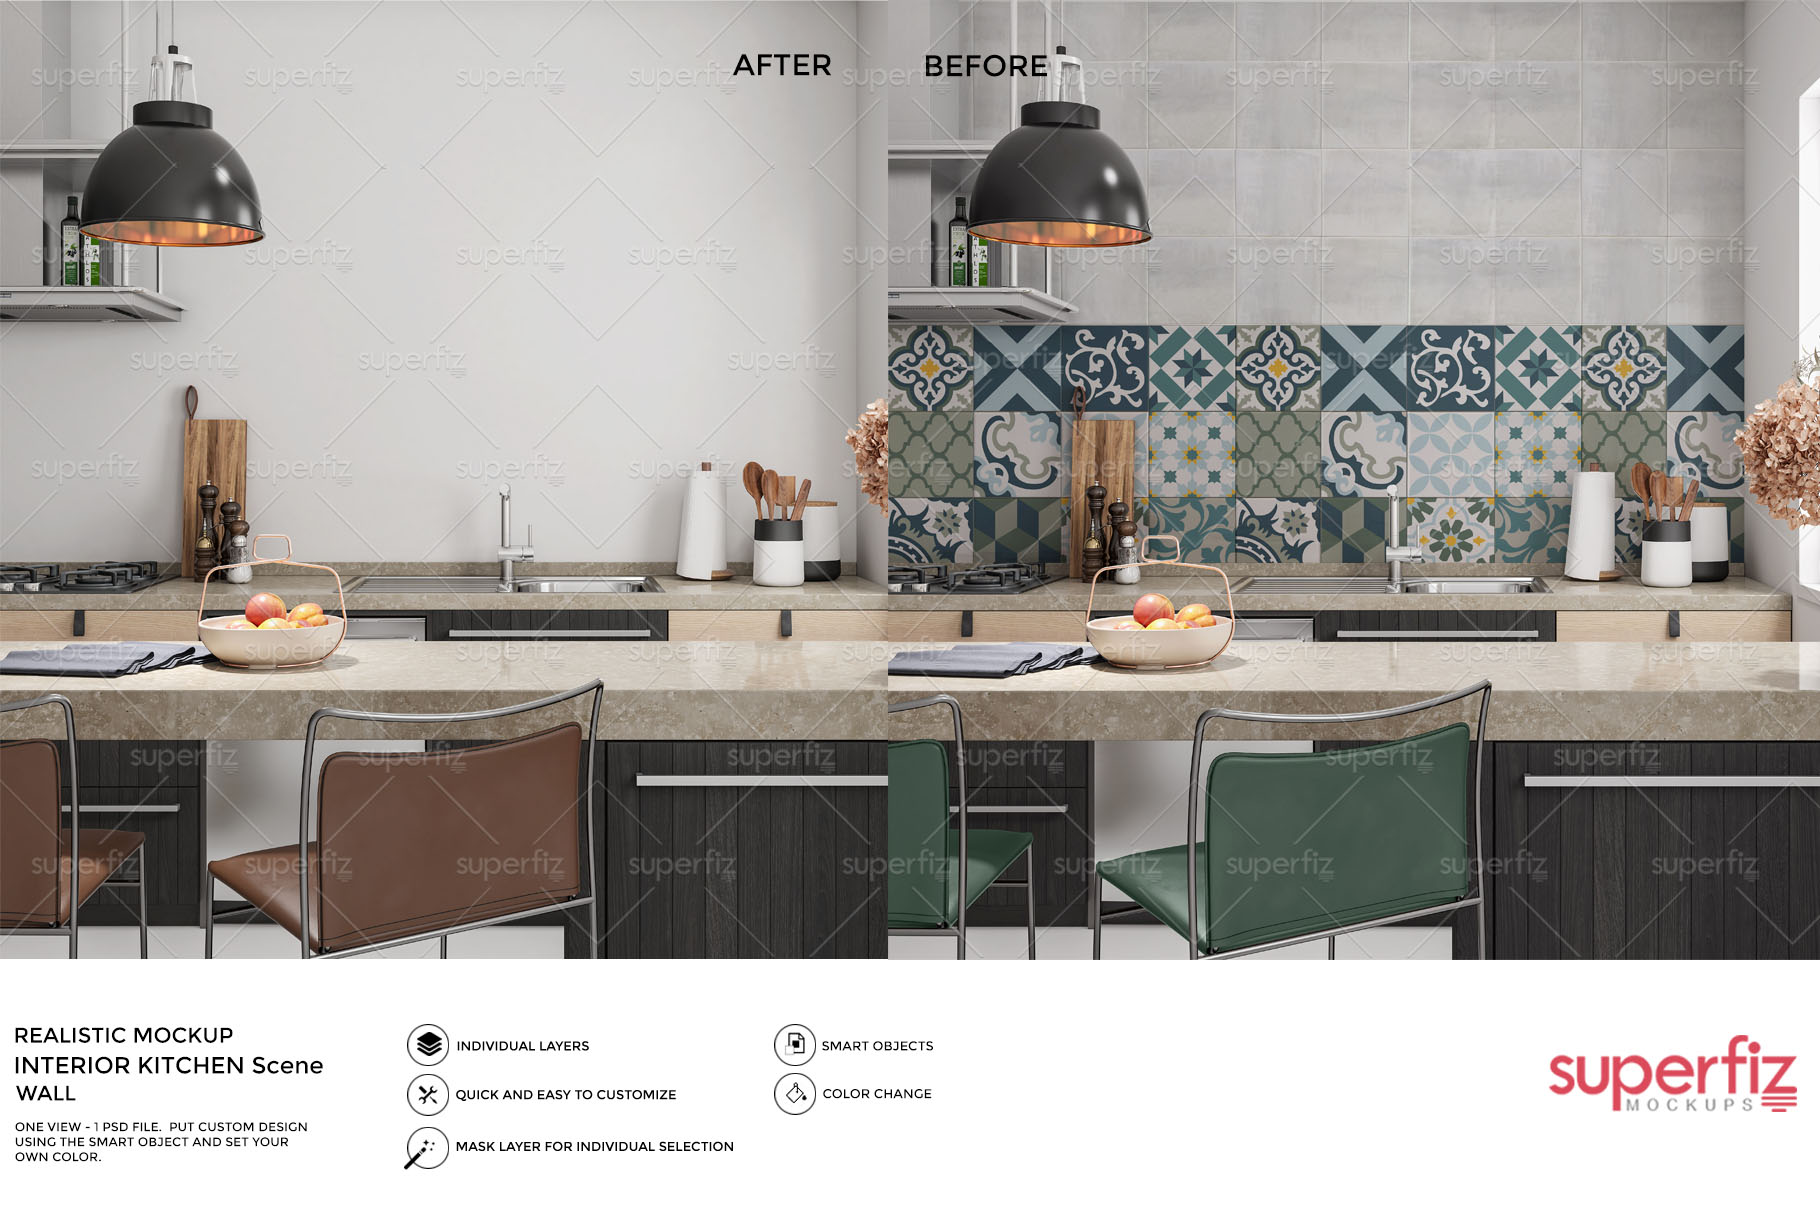 Blank Wall Kitchen PSD Mockup SM73 example image 2